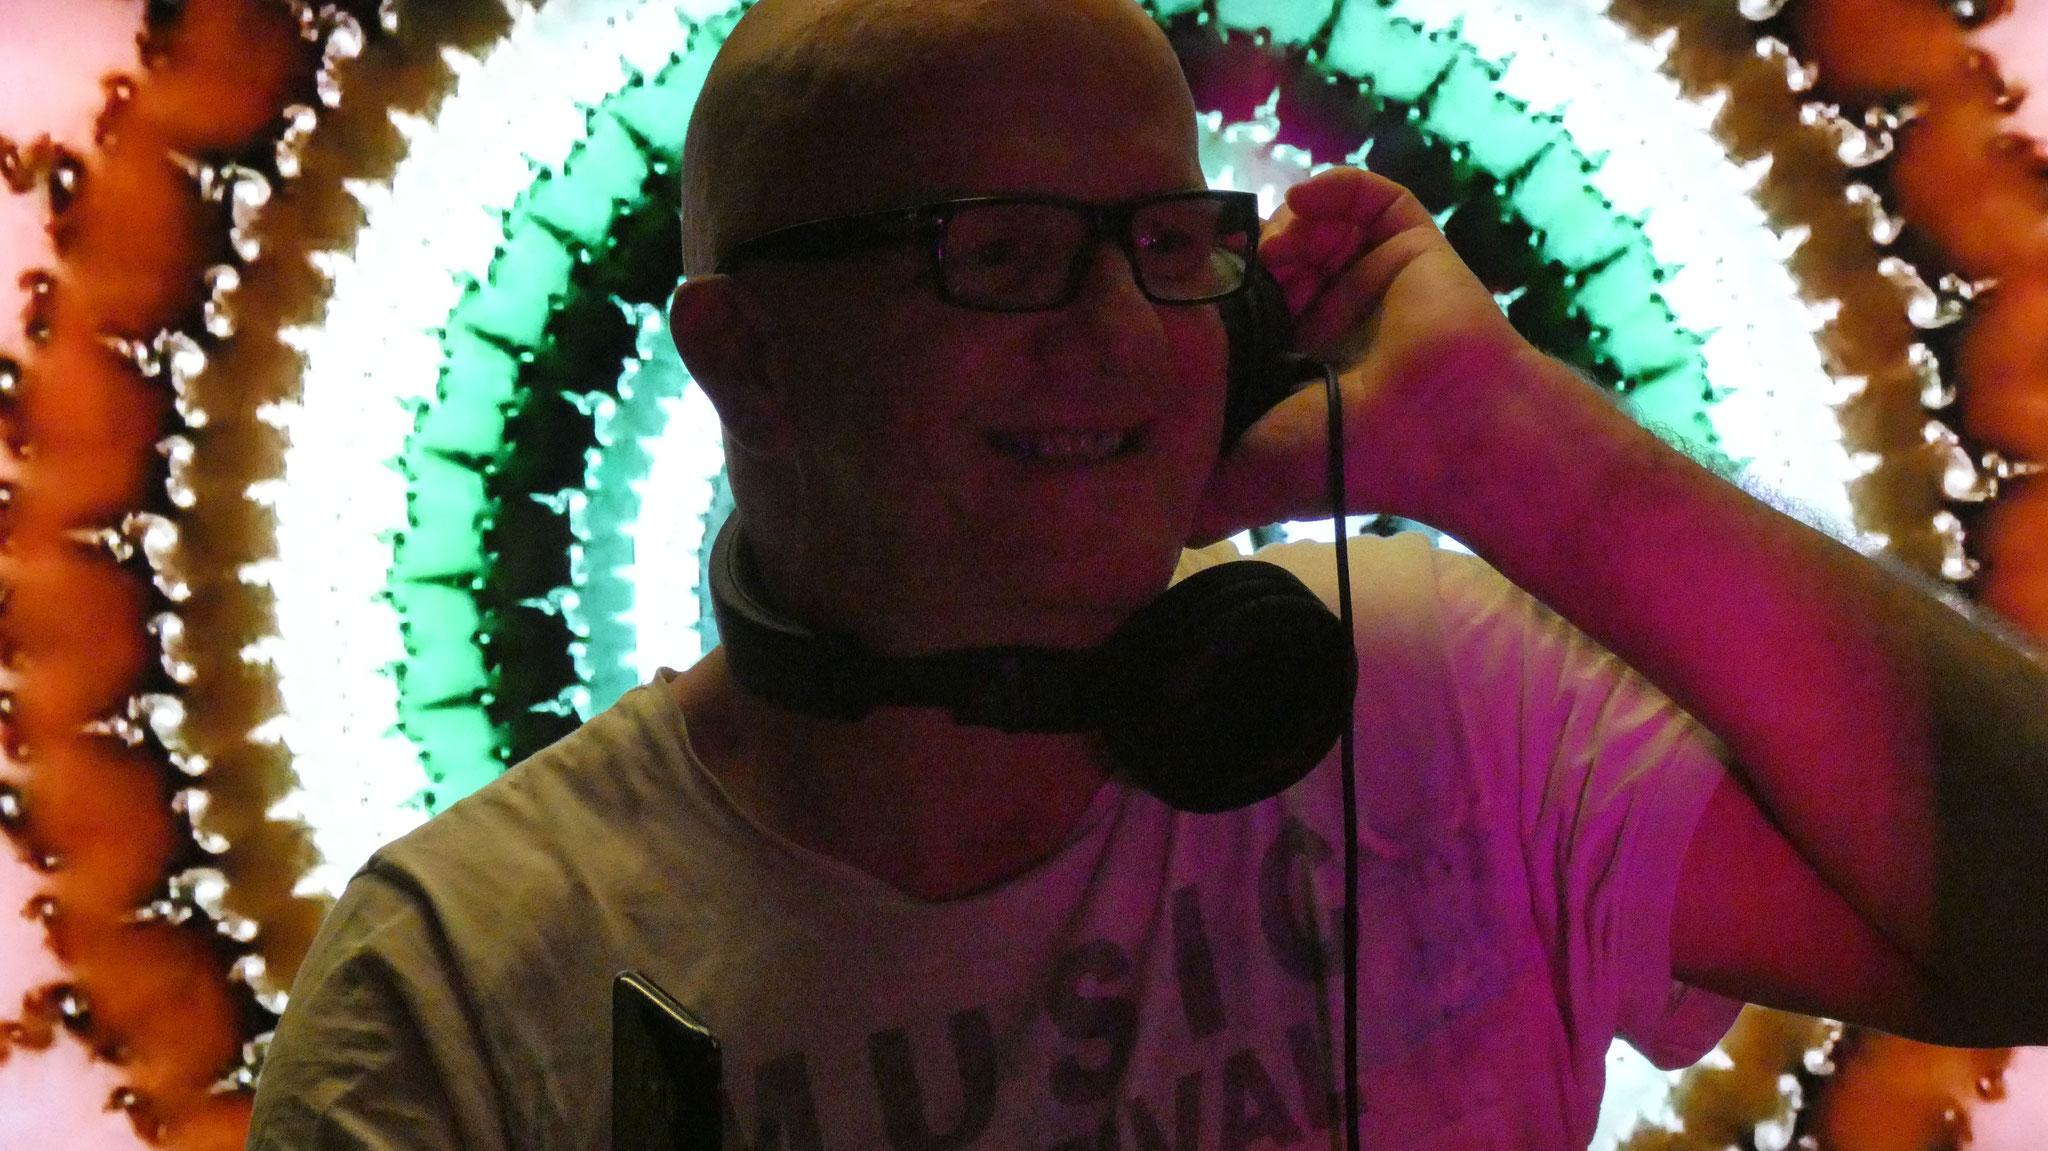 DJing Chris Bernard